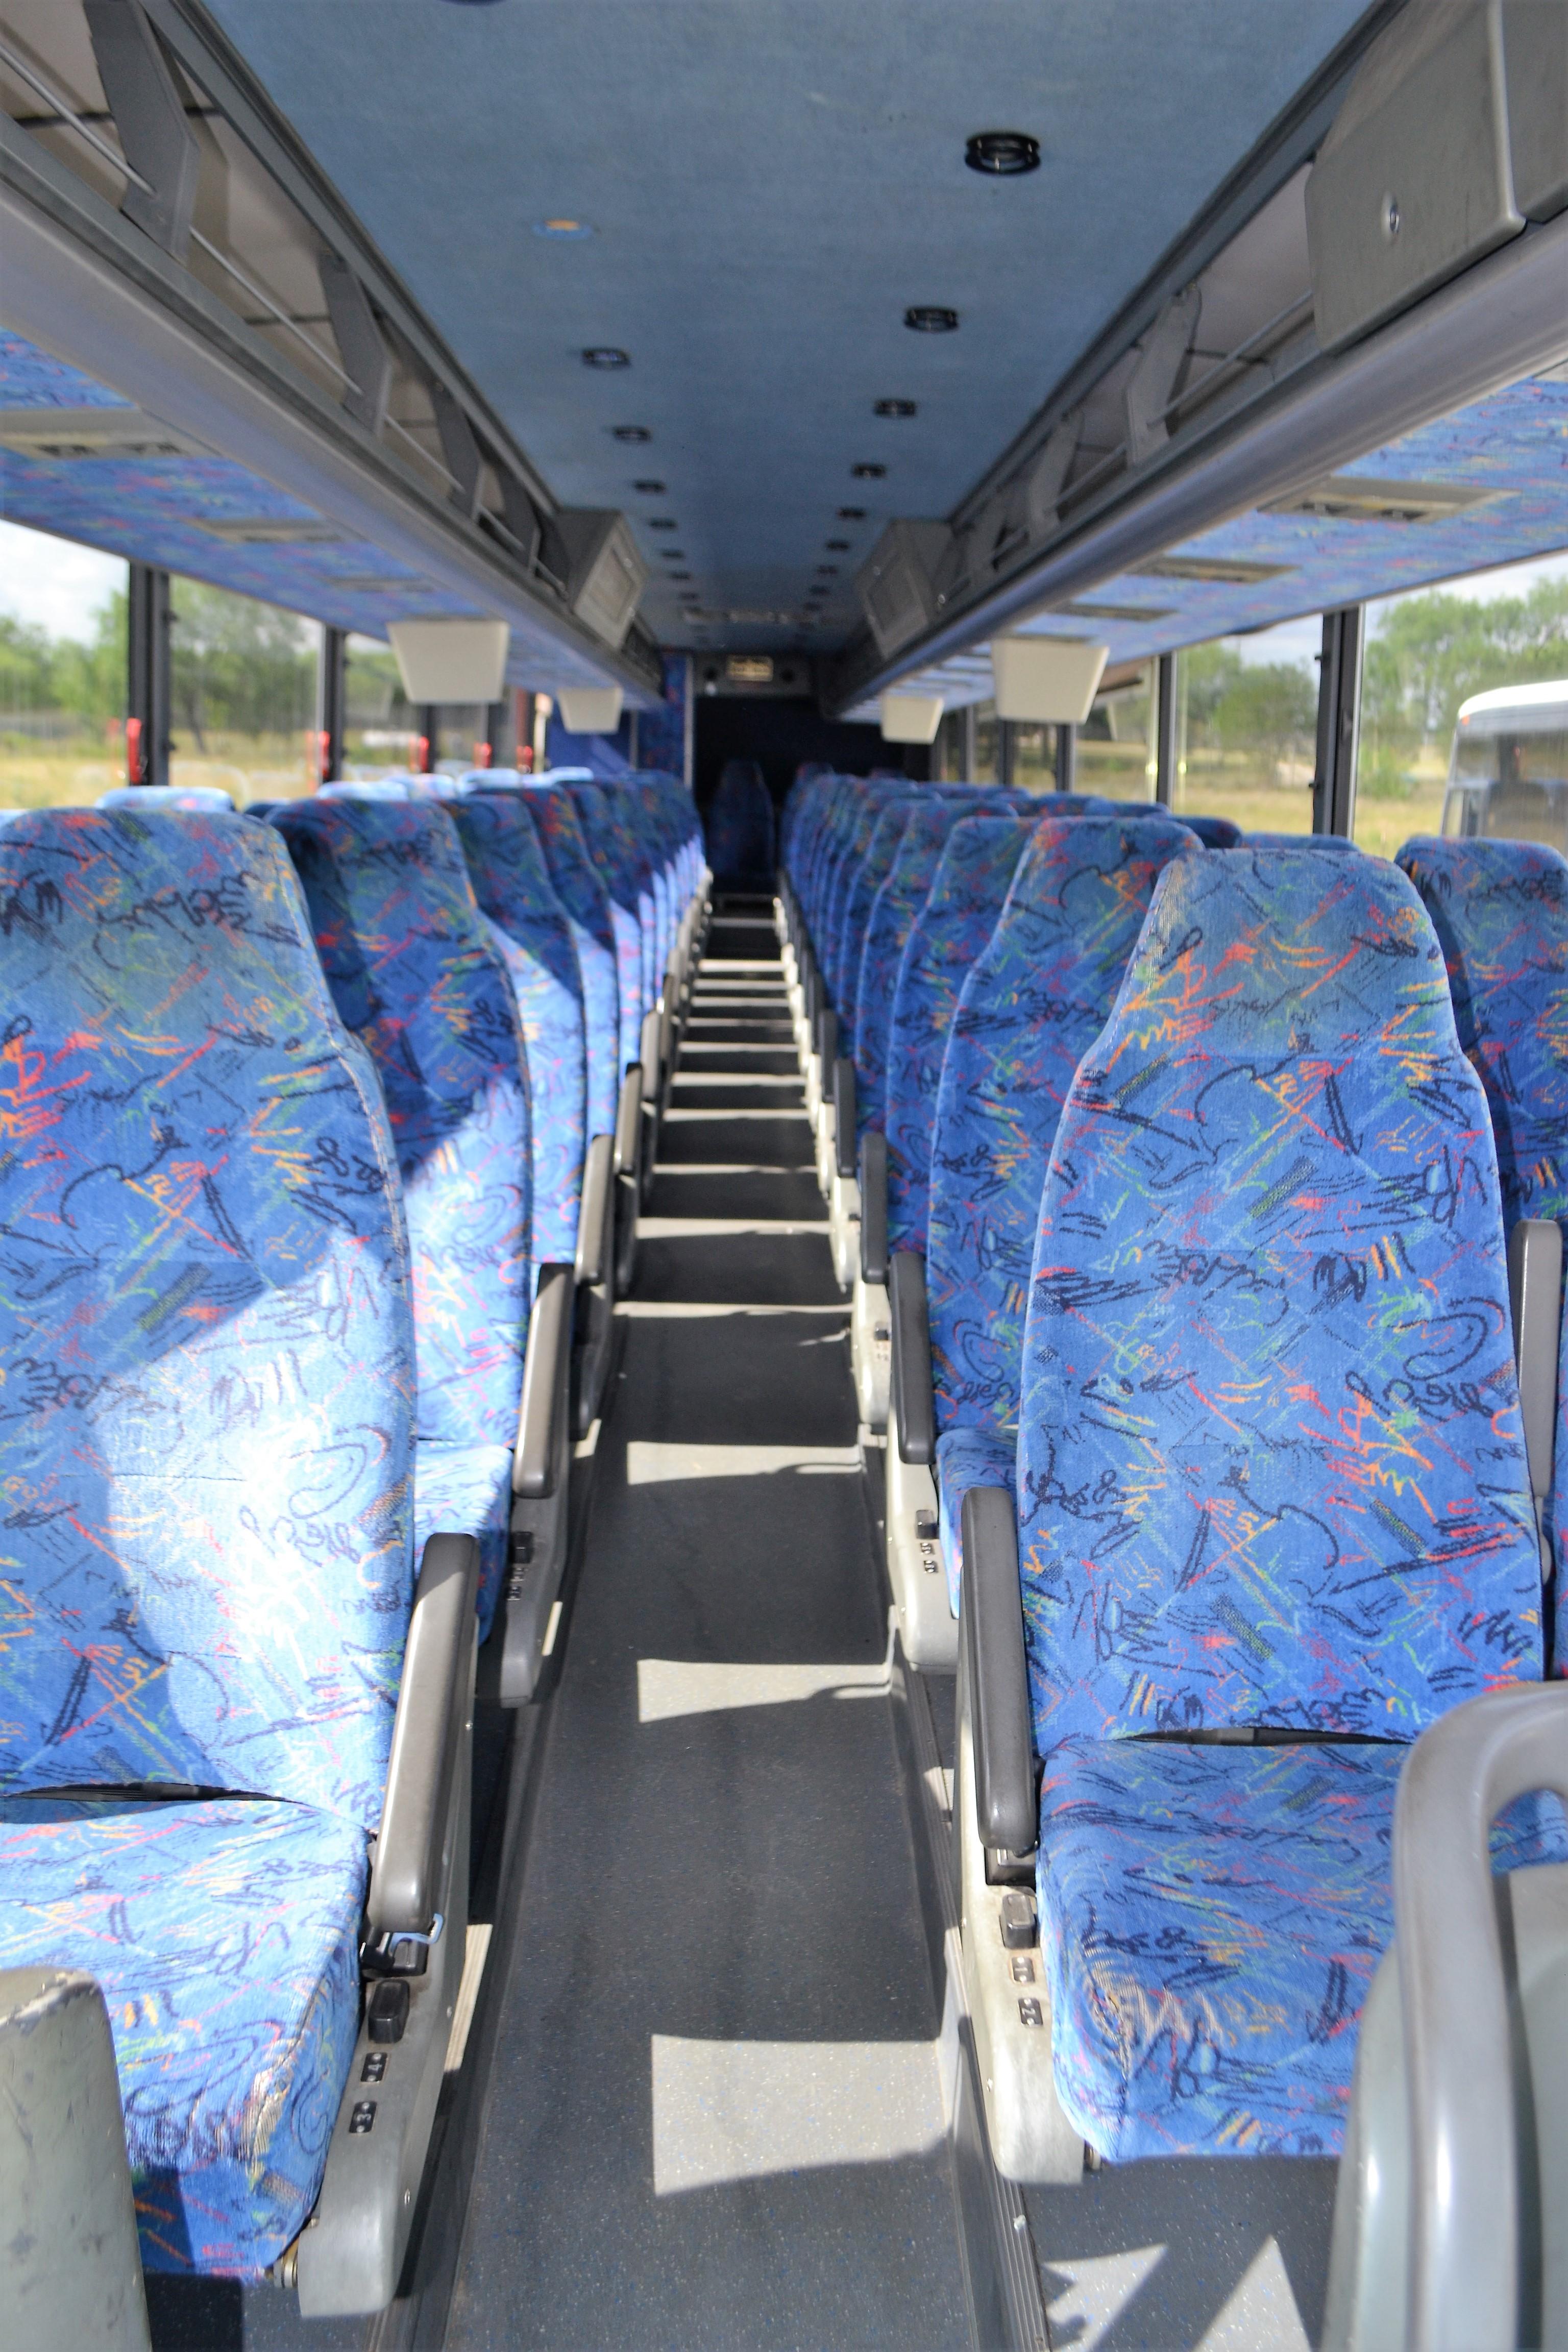 Lot 3 - 2004 Van Hool Commuter Bus # 557